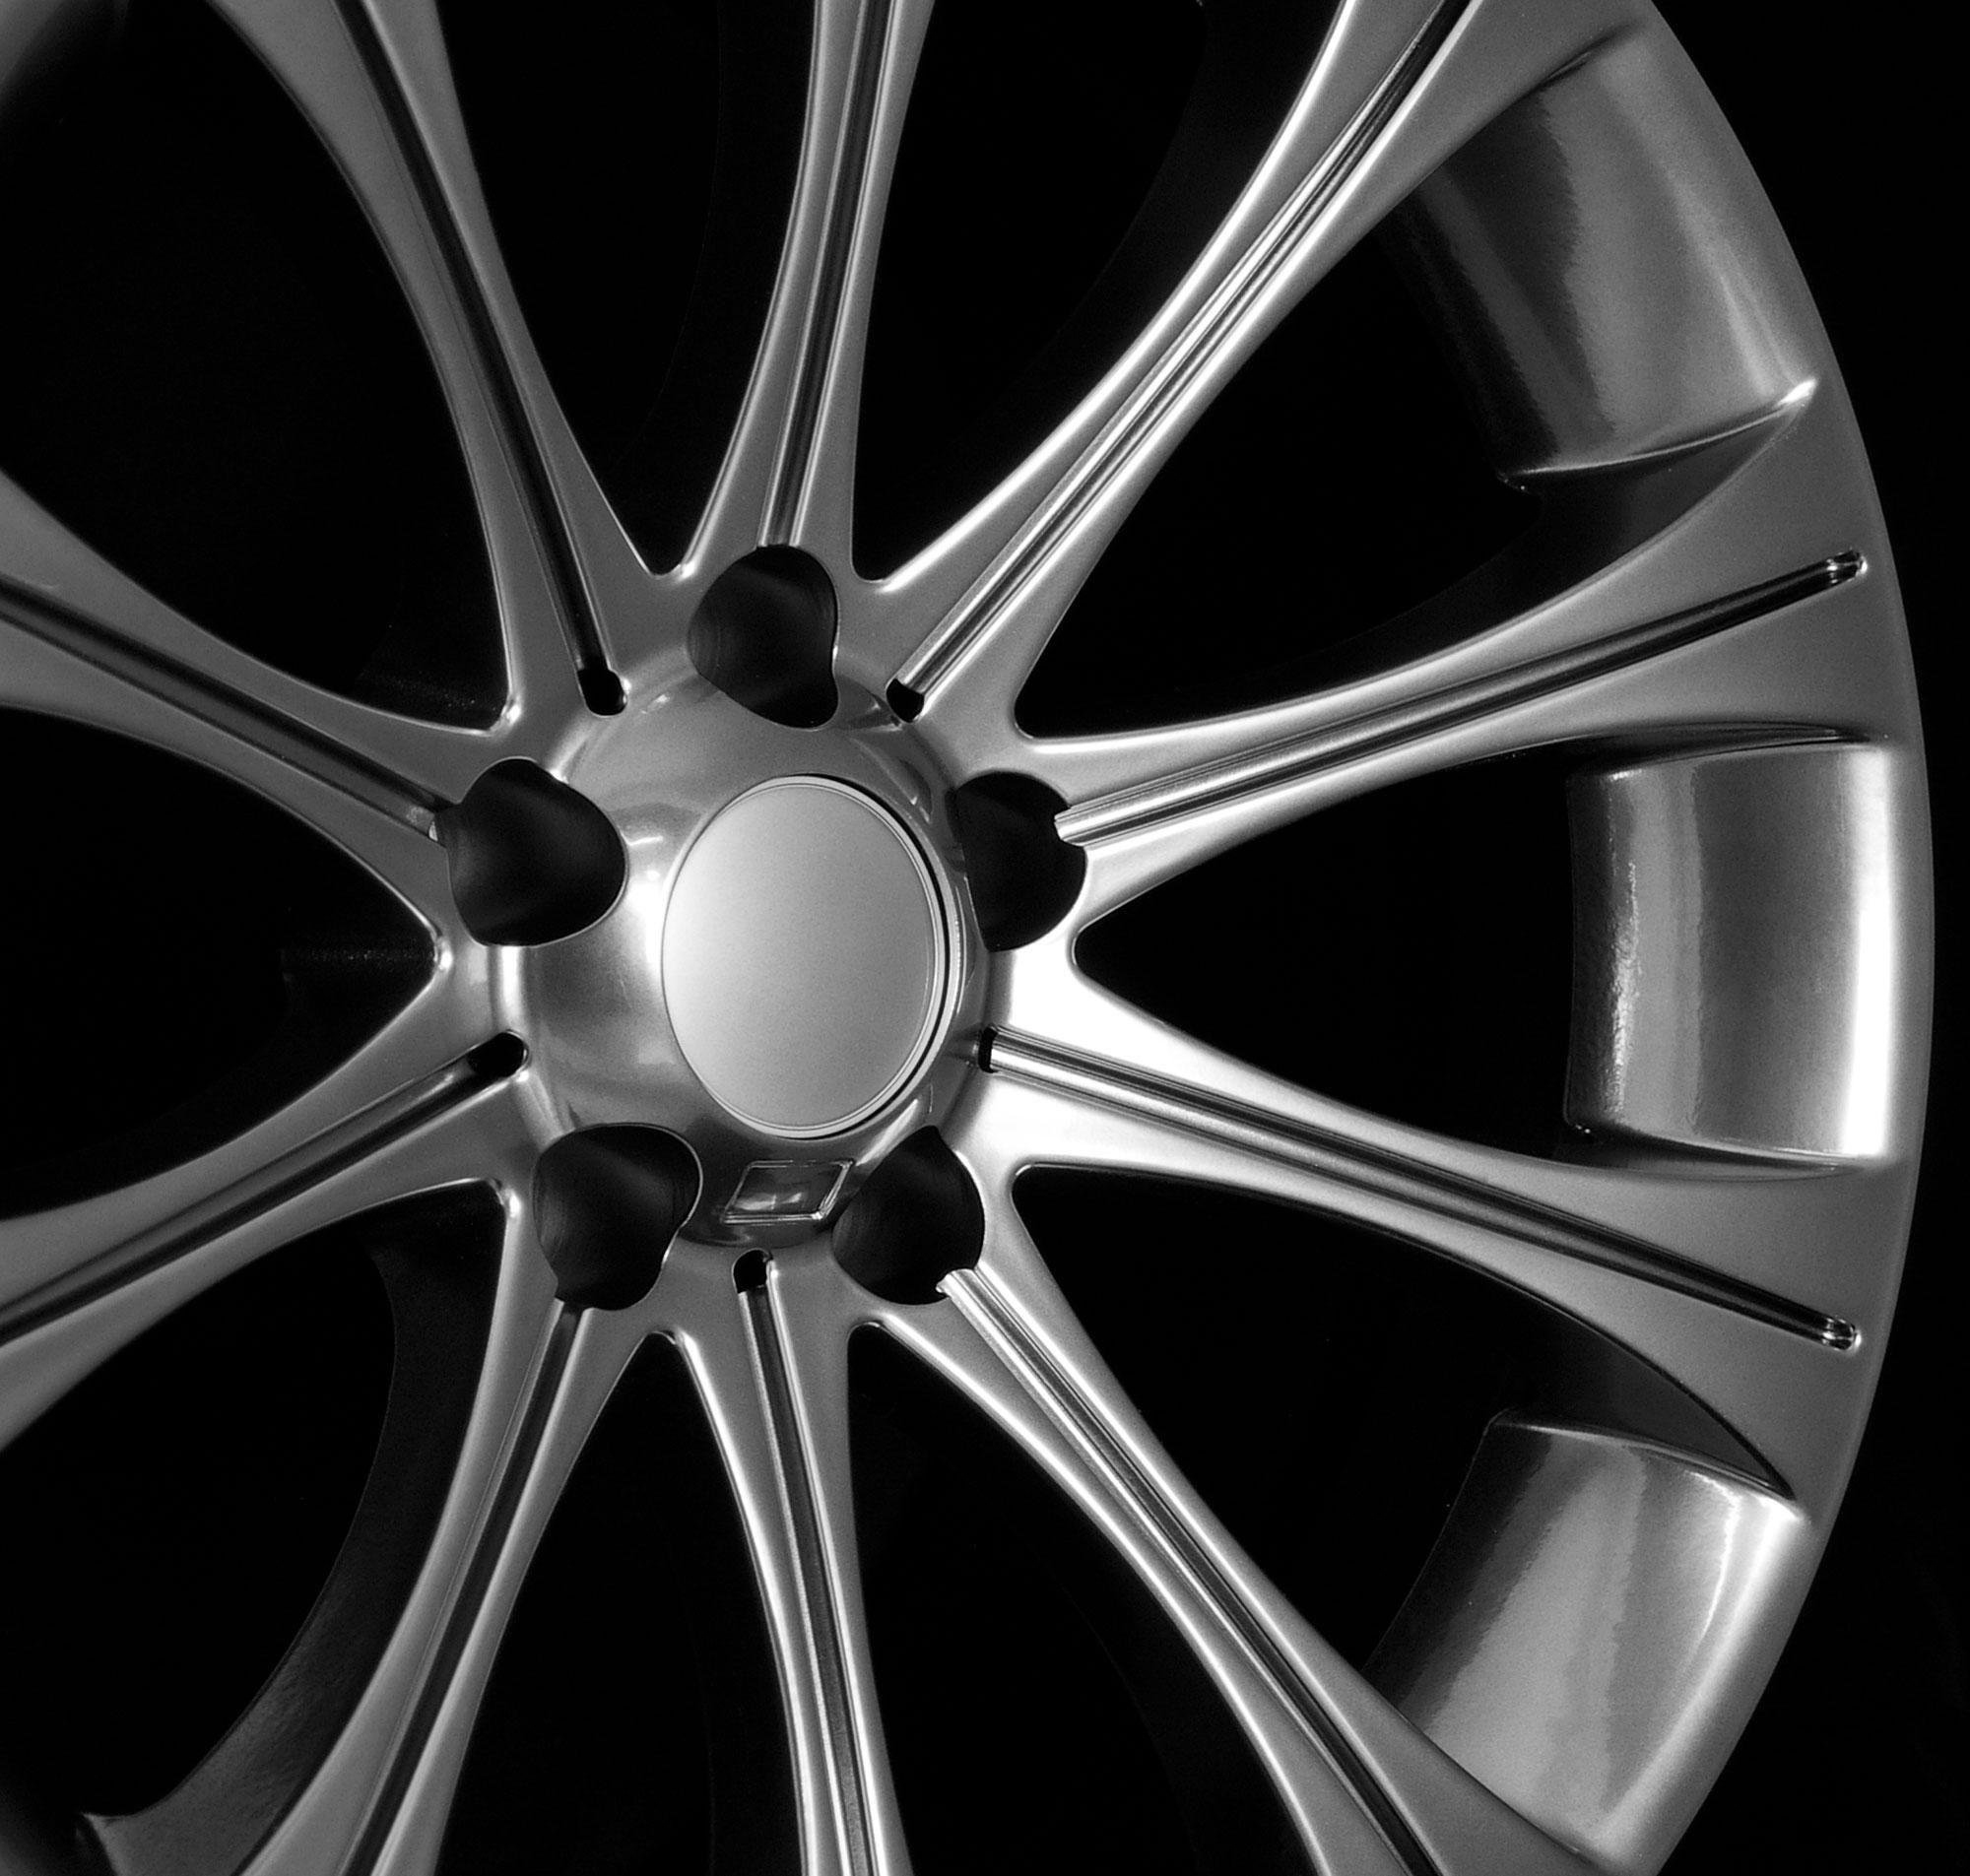 Staggered Hyper Black Wheels Rims Fit BMW 323i 325i 328i 330i 335i